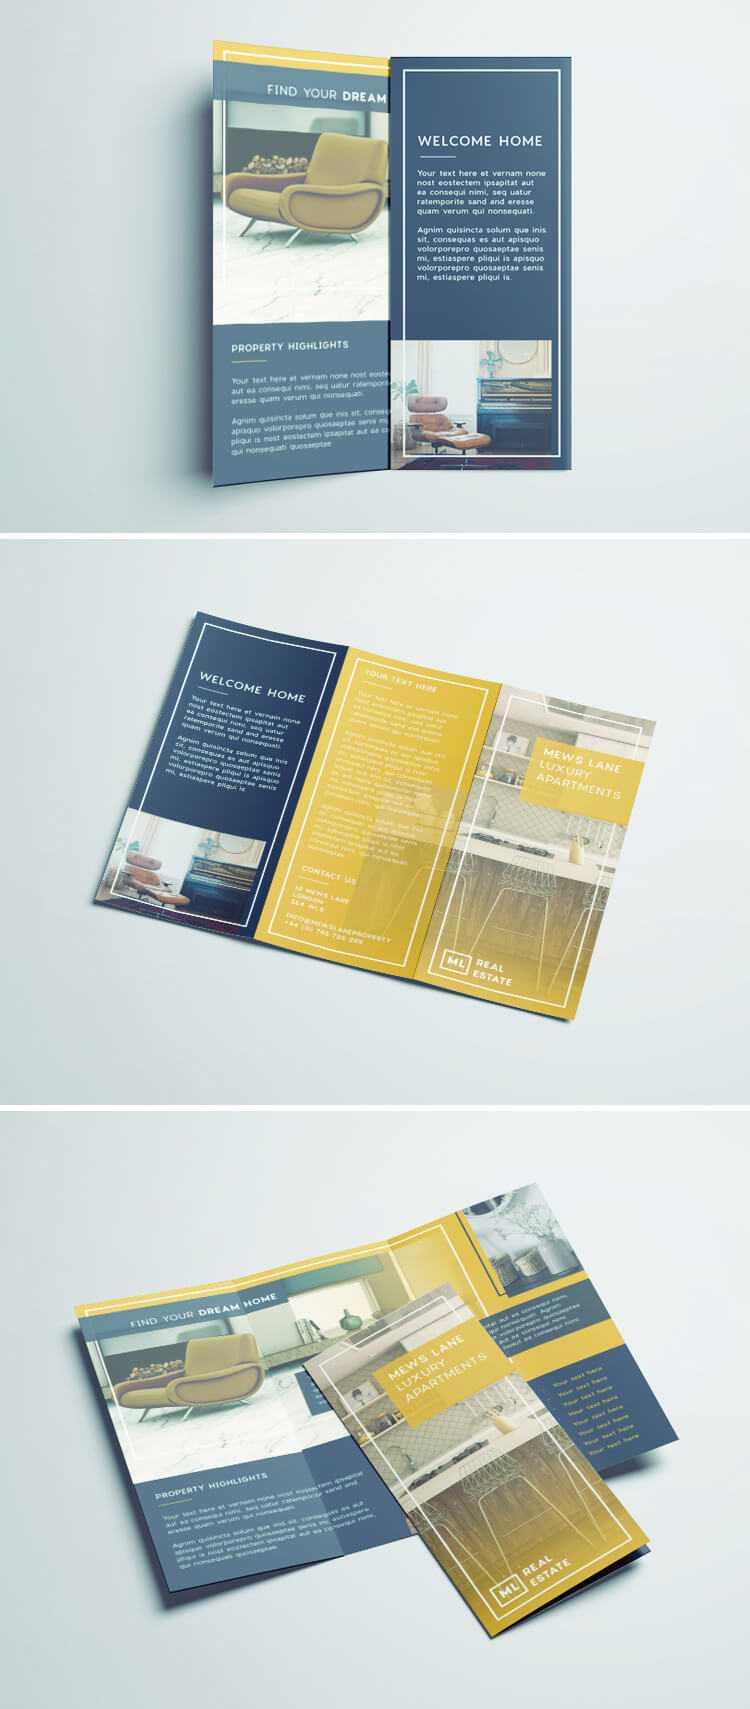 Tri Fold Brochure | Free Indesign Template Within Adobe Indesign Tri Fold Brochure Template